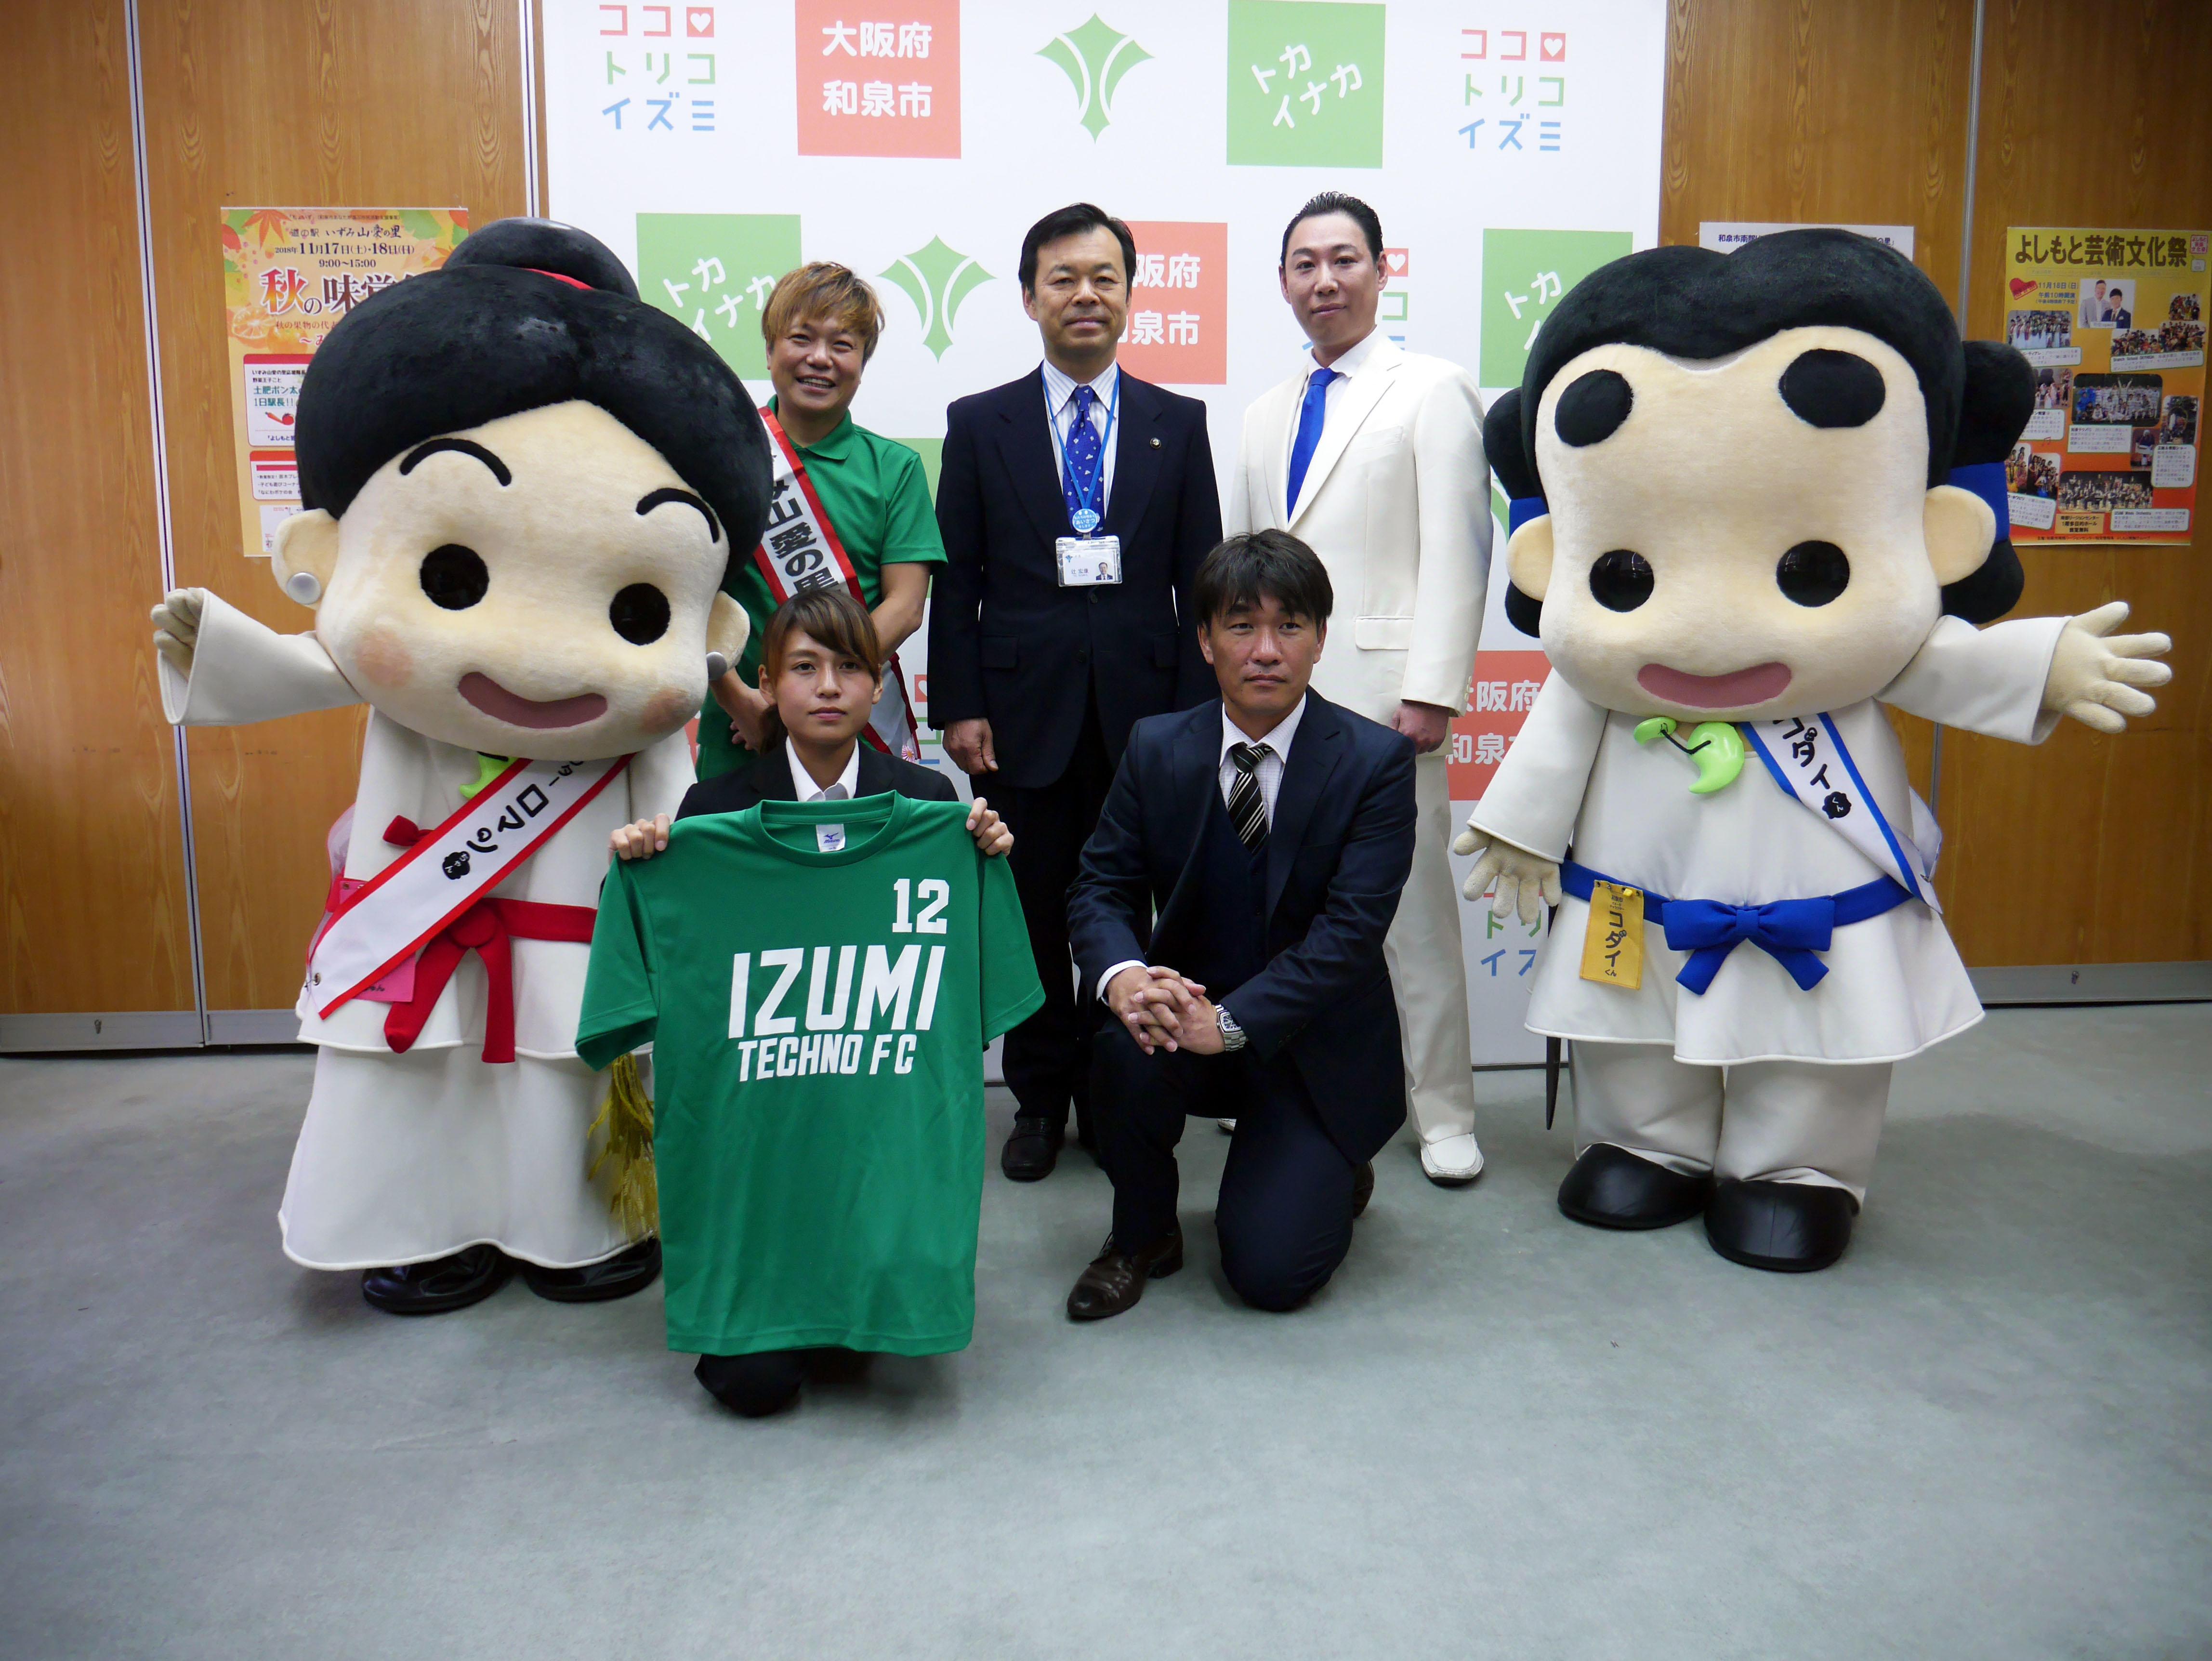 http://news.yoshimoto.co.jp/20181102220017-8806d665c5060a2fcfe4a9f36d875554ba7d3c93.jpg